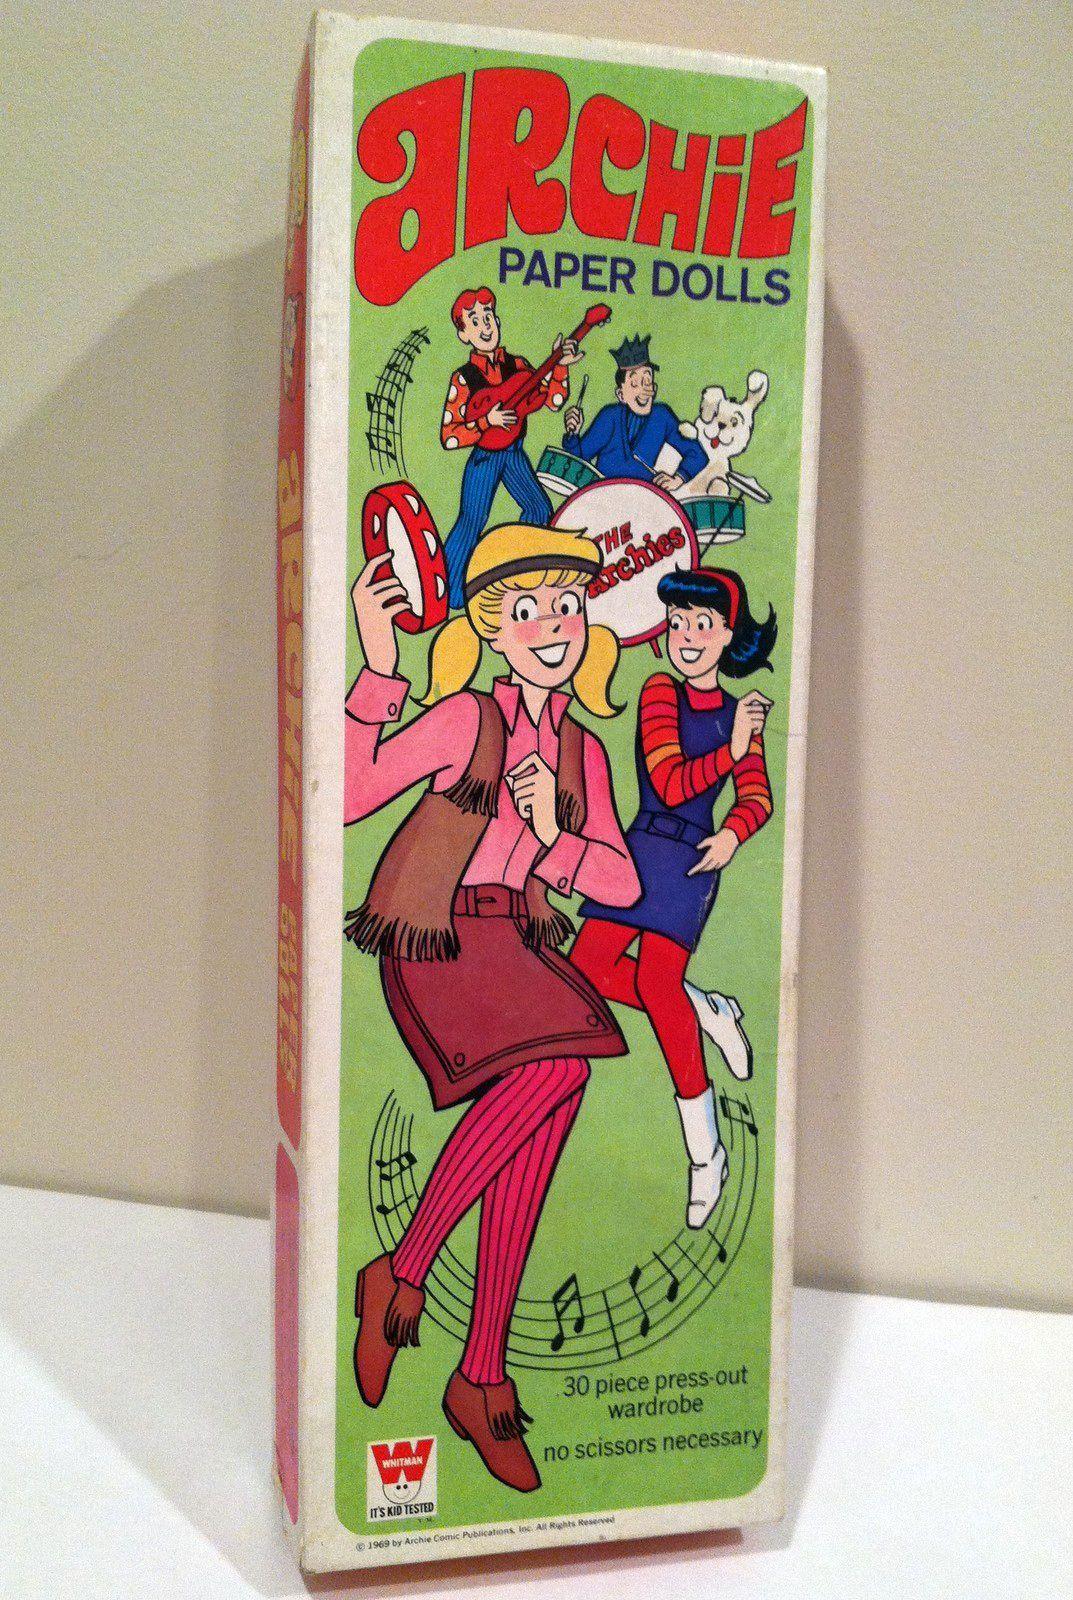 Archie paper dolls